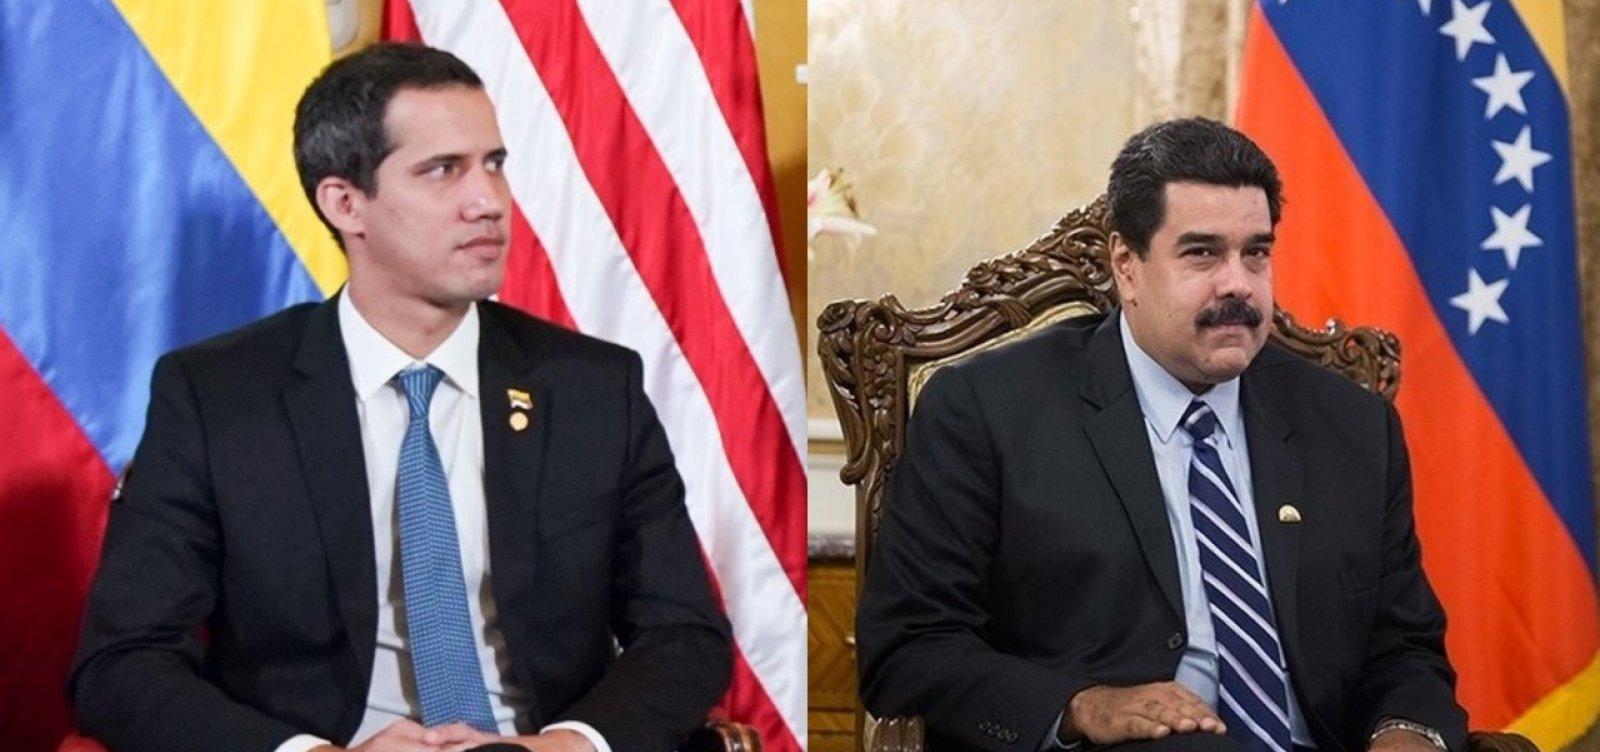 Guaidó e Maduro aceitam convite para nova rodada de conversas na Noruega